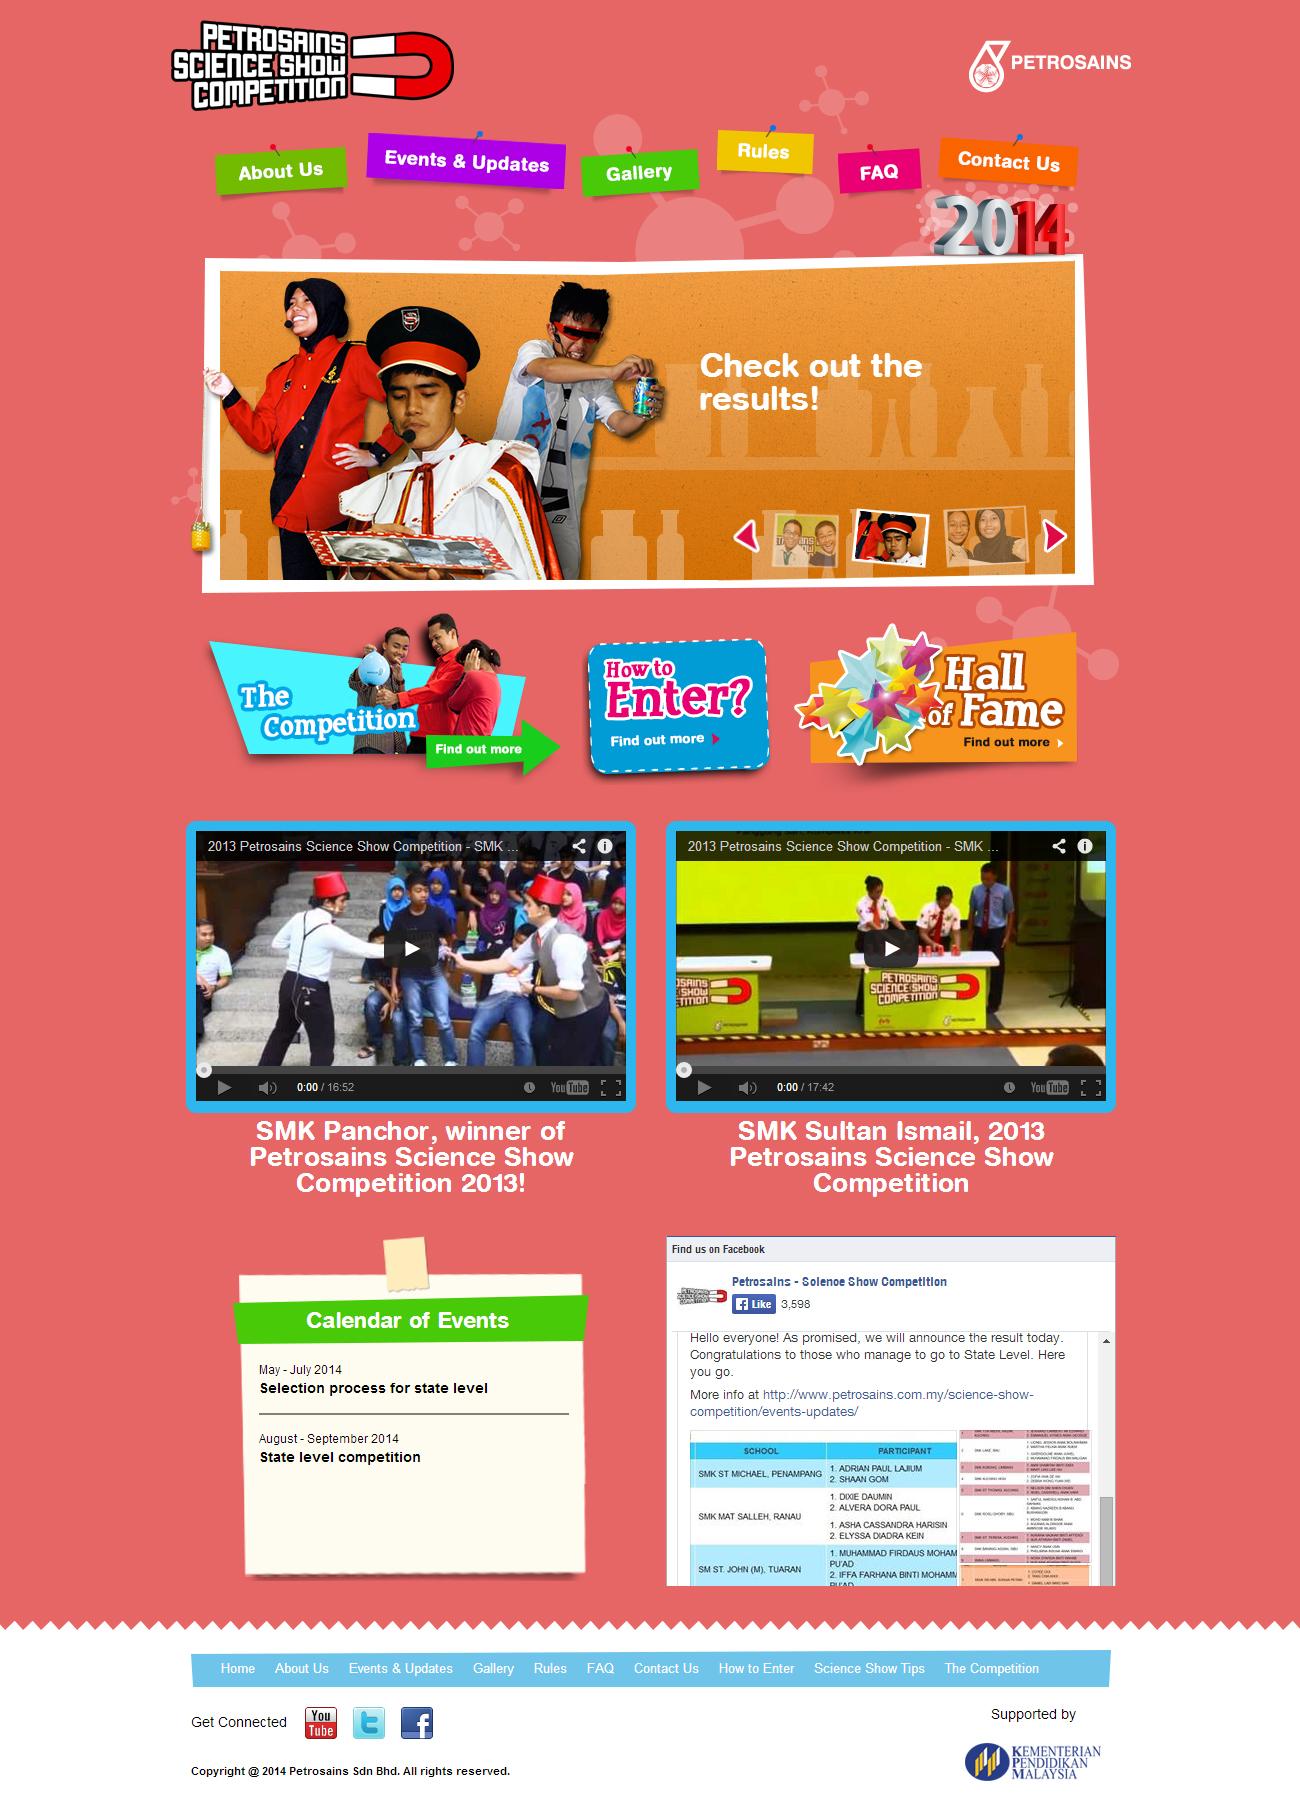 Petrosains Science Show Competition 2013 Website